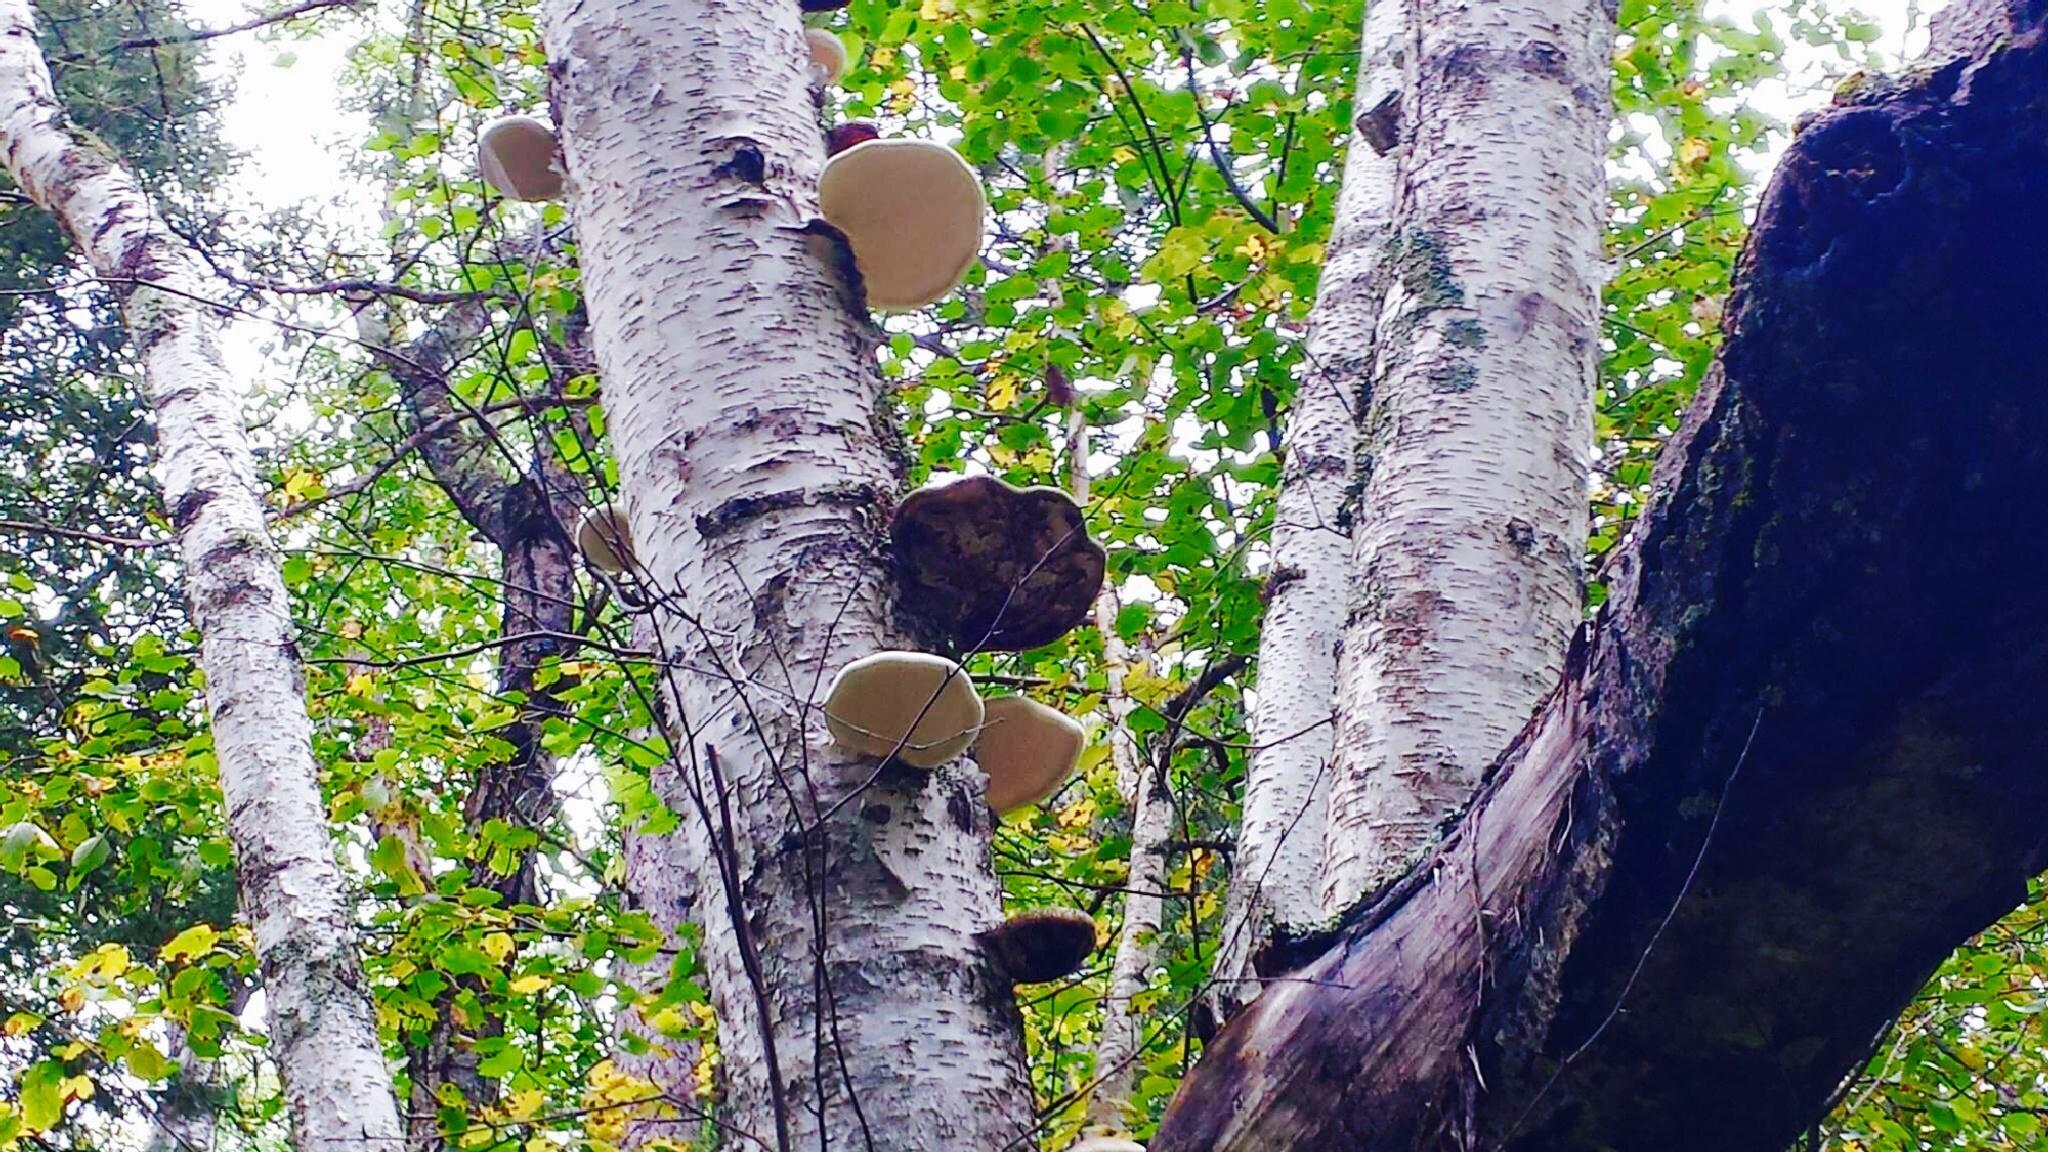 Mushroom steps on tree by ReneeEPlemmons